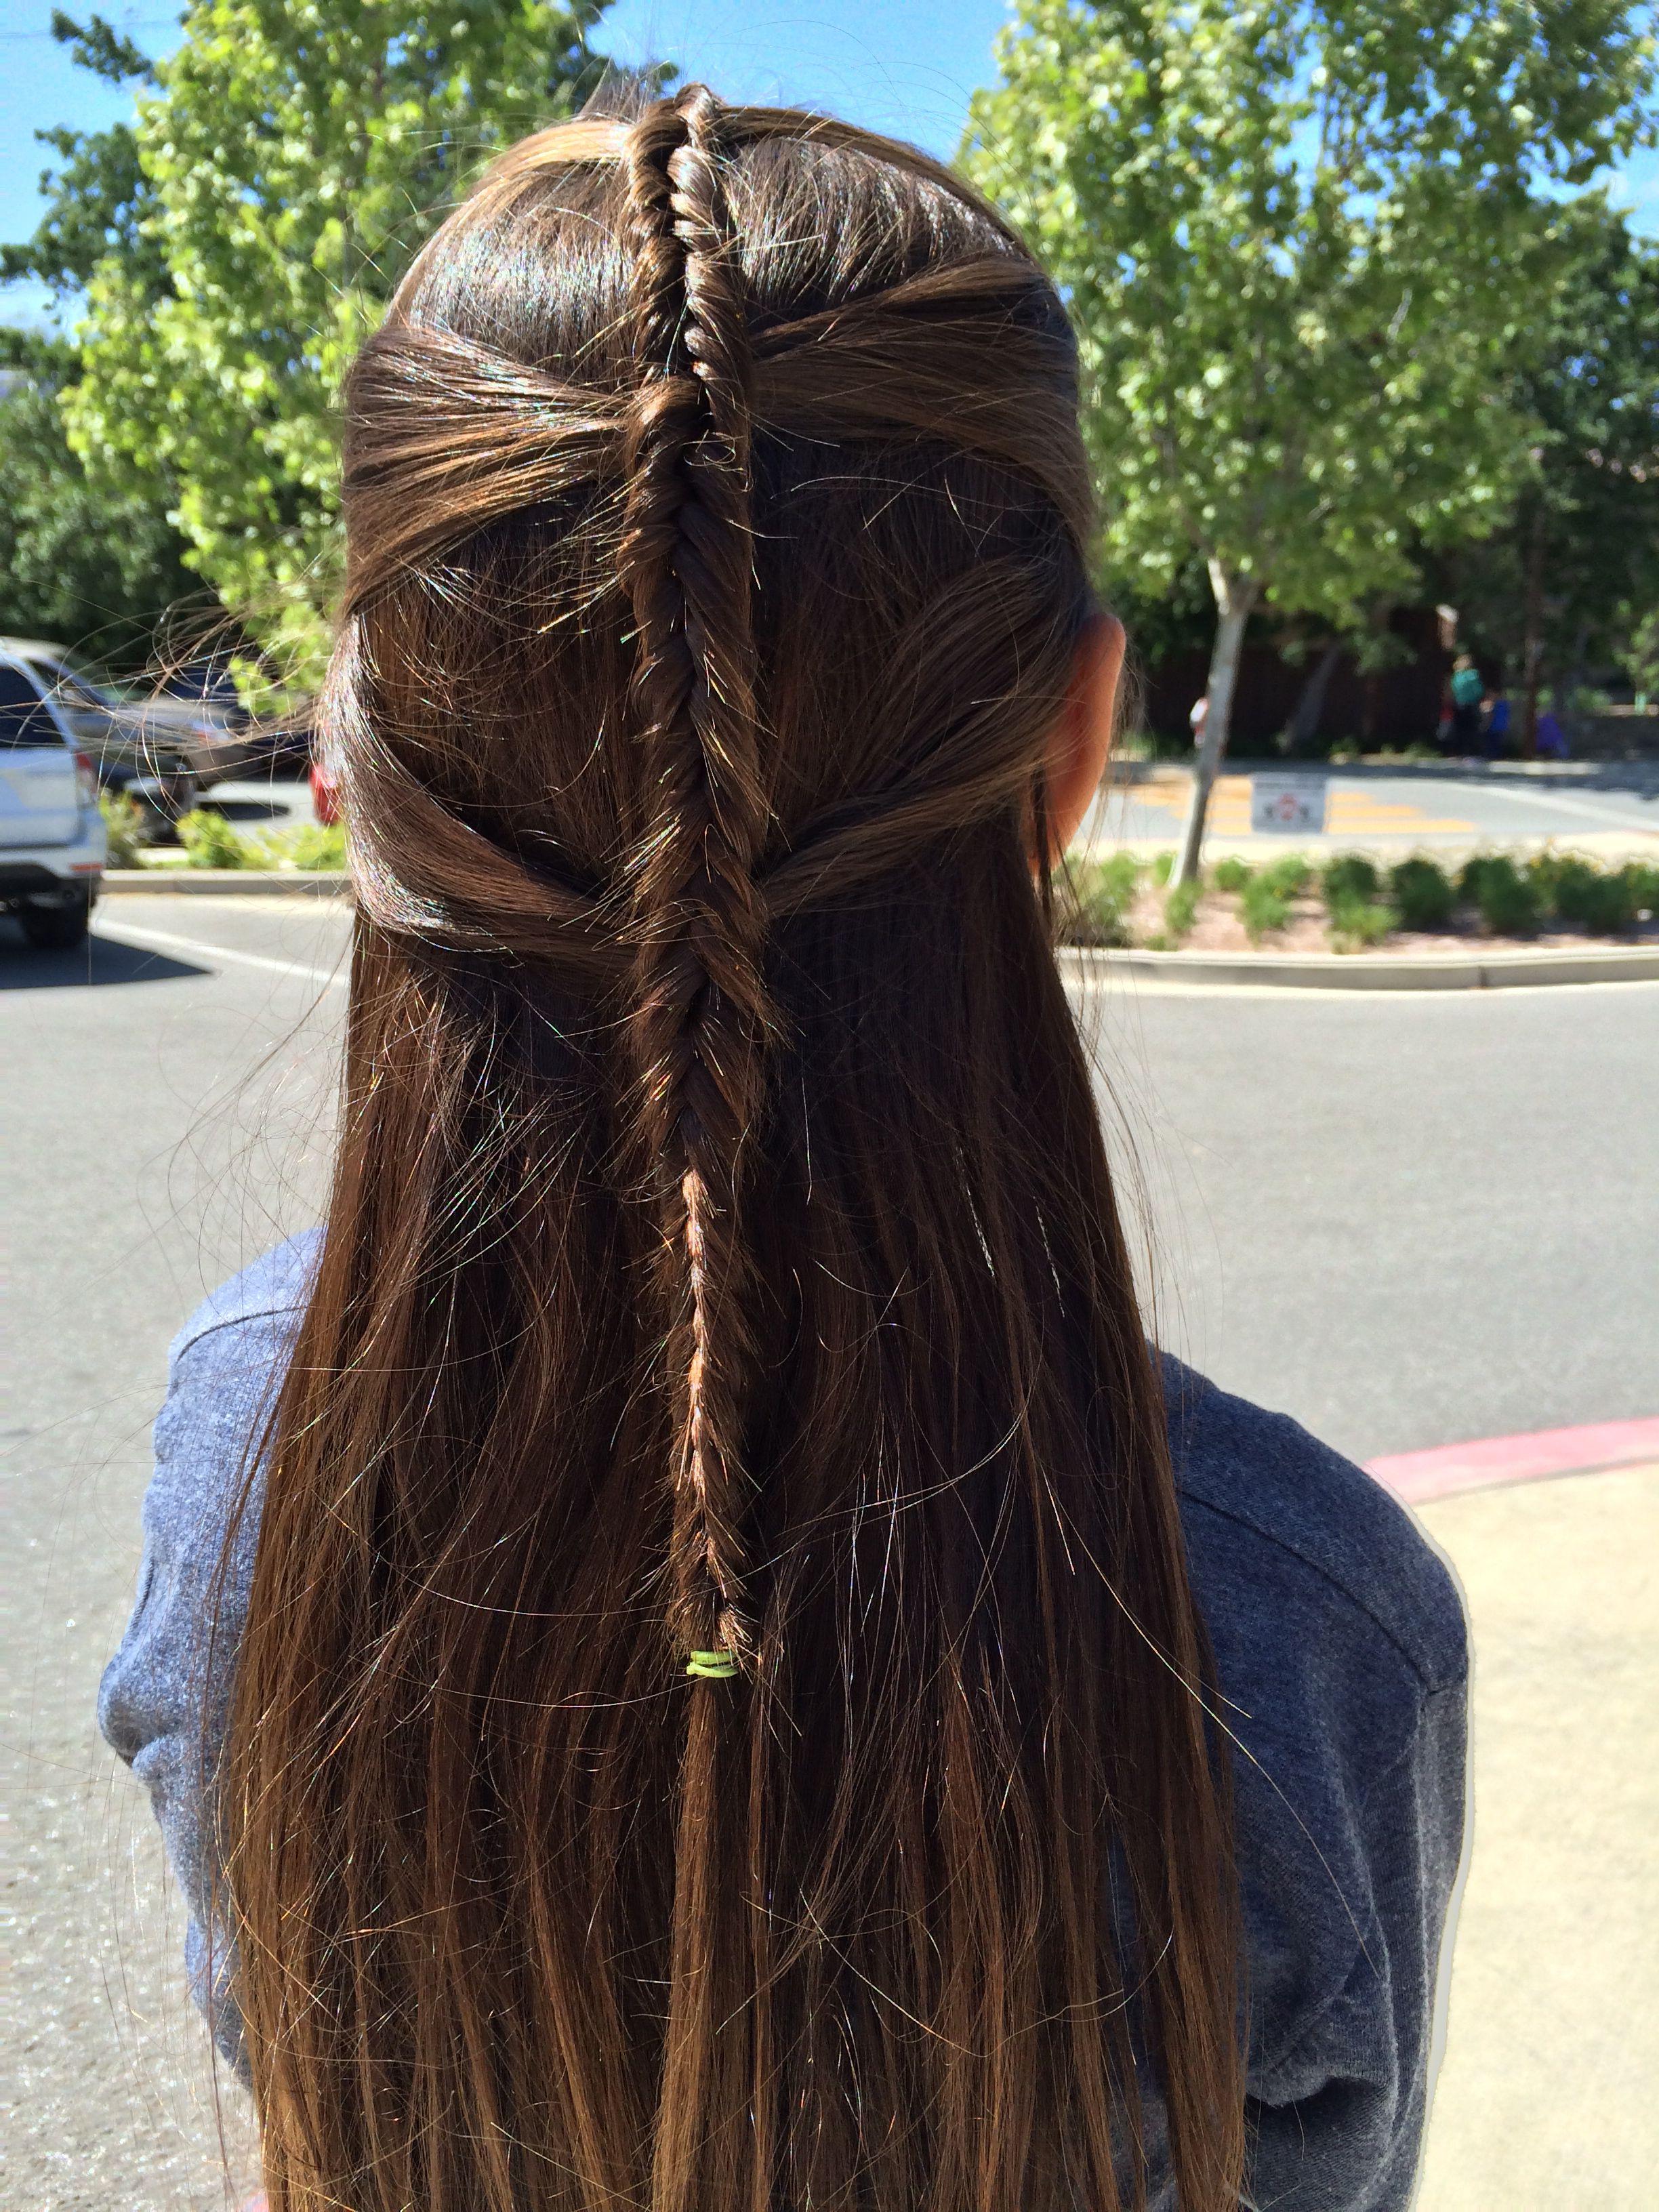 Pin By Taylor Evans On Hairstyles Hair Styles Elf Hair Elvish Hairstyles